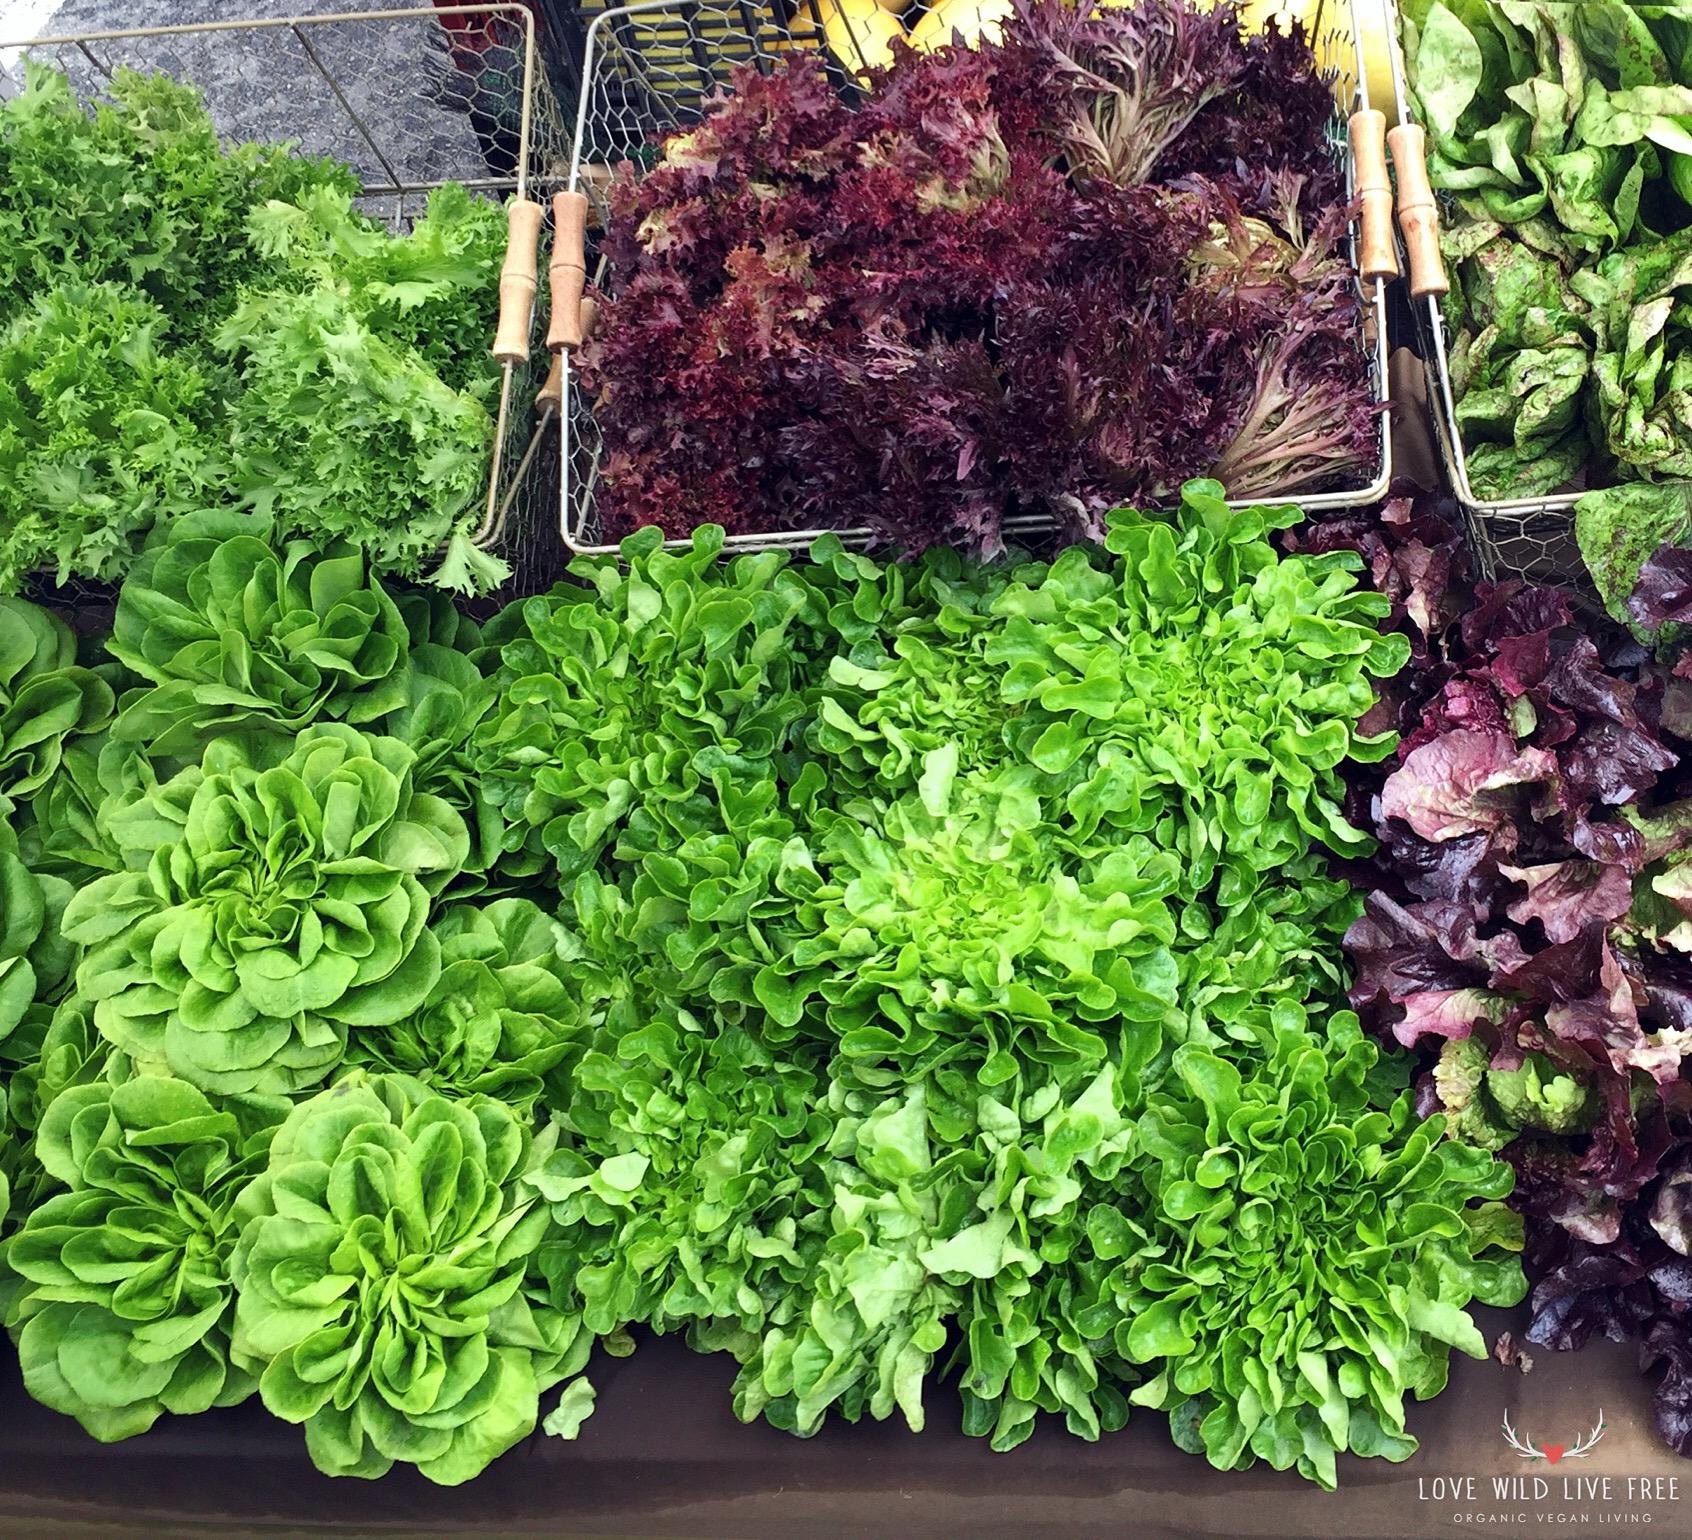 The prettiest organic market finds from the Downtown Santa Monica Farmers' Market.